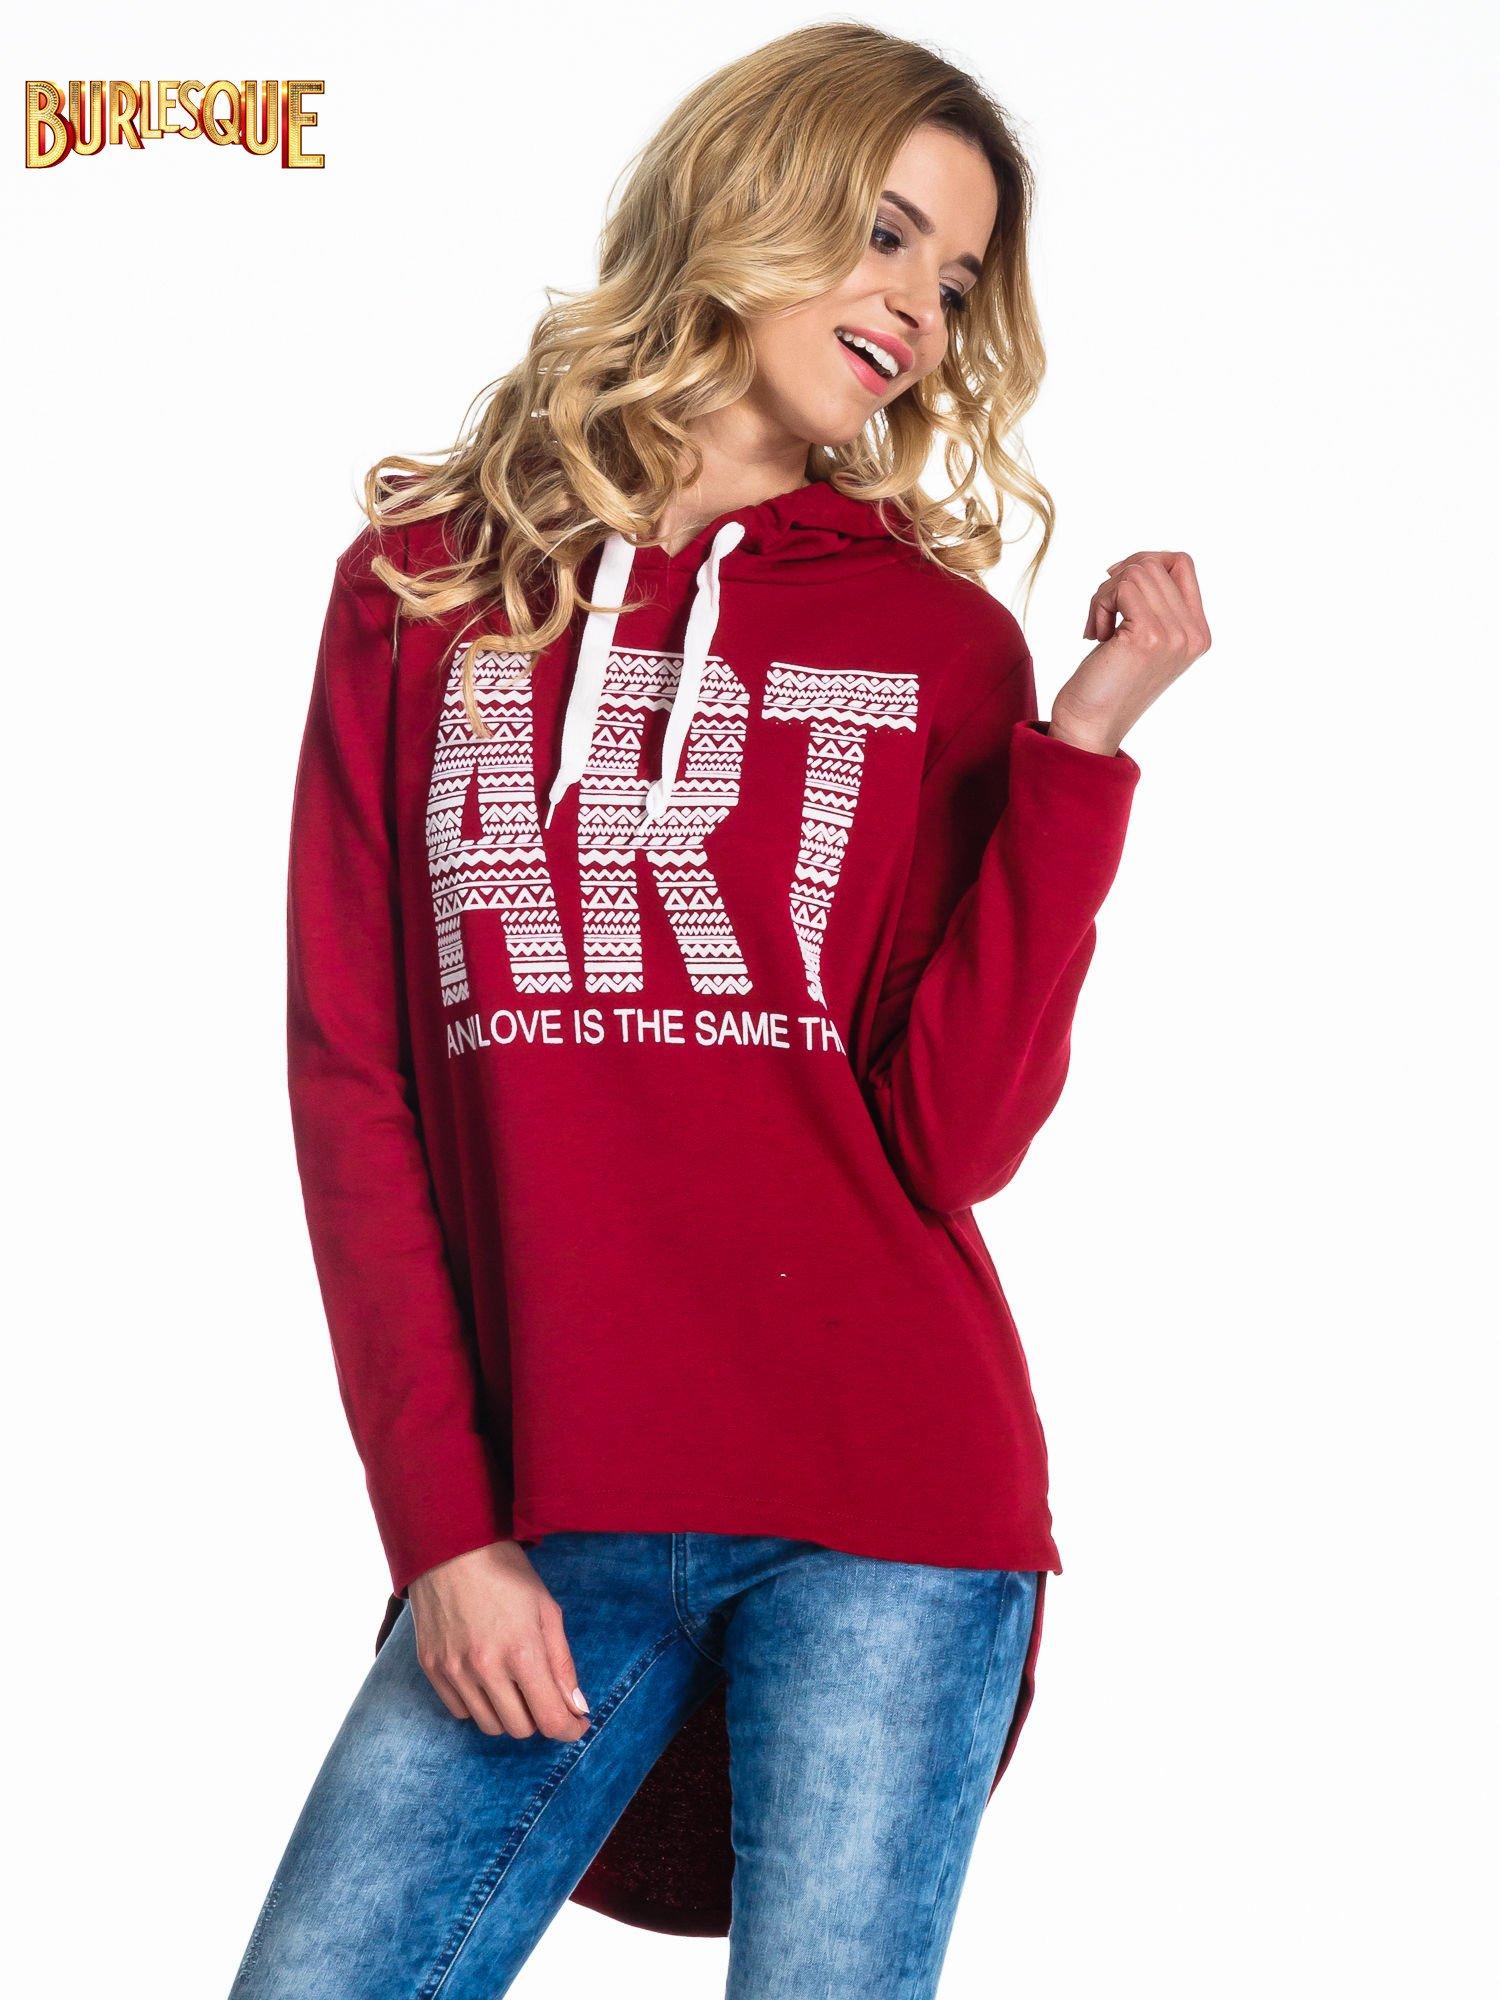 Czerwona damska bluza z kapturem i napisem ART                                  zdj.                                  1